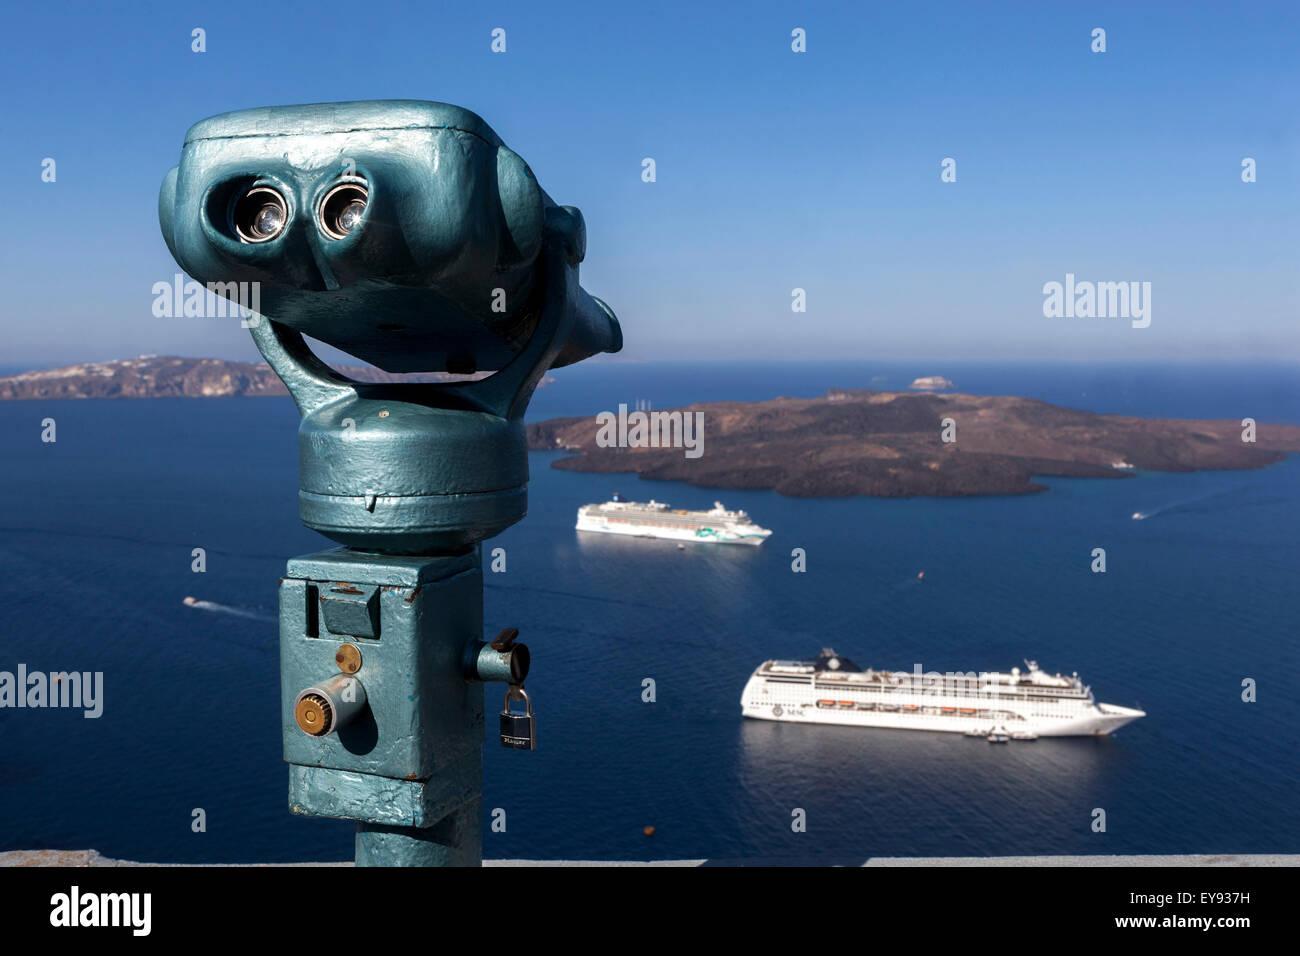 Terrace, Binocular, Santorini, Cyclades Islands, Greece, Europe - Stock Image